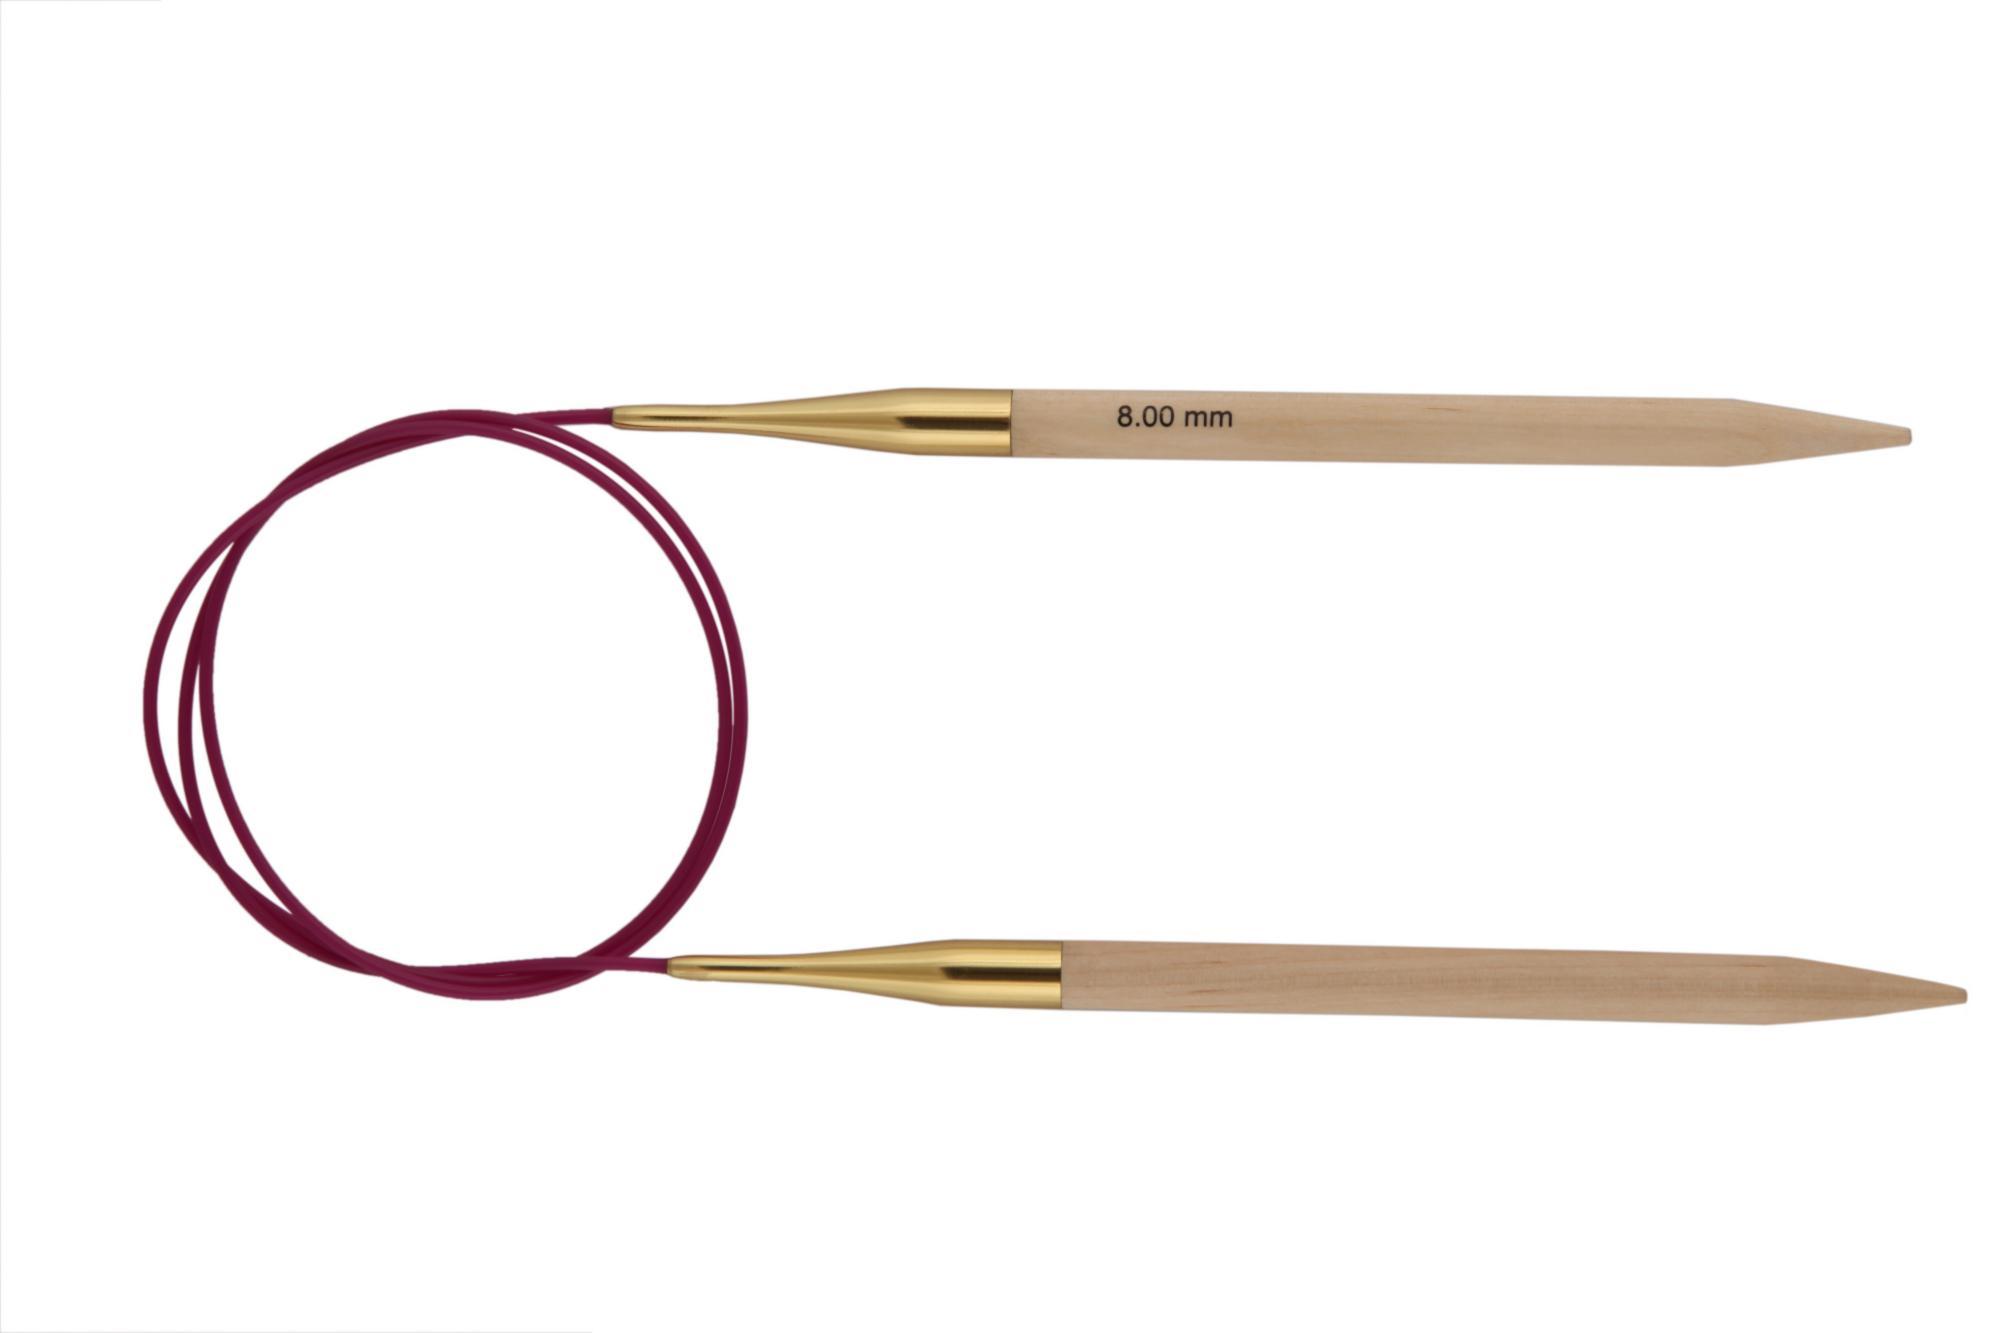 Спицы круговые 80 см Basix Birch Wood KnitPro, 35335, 8.00 мм